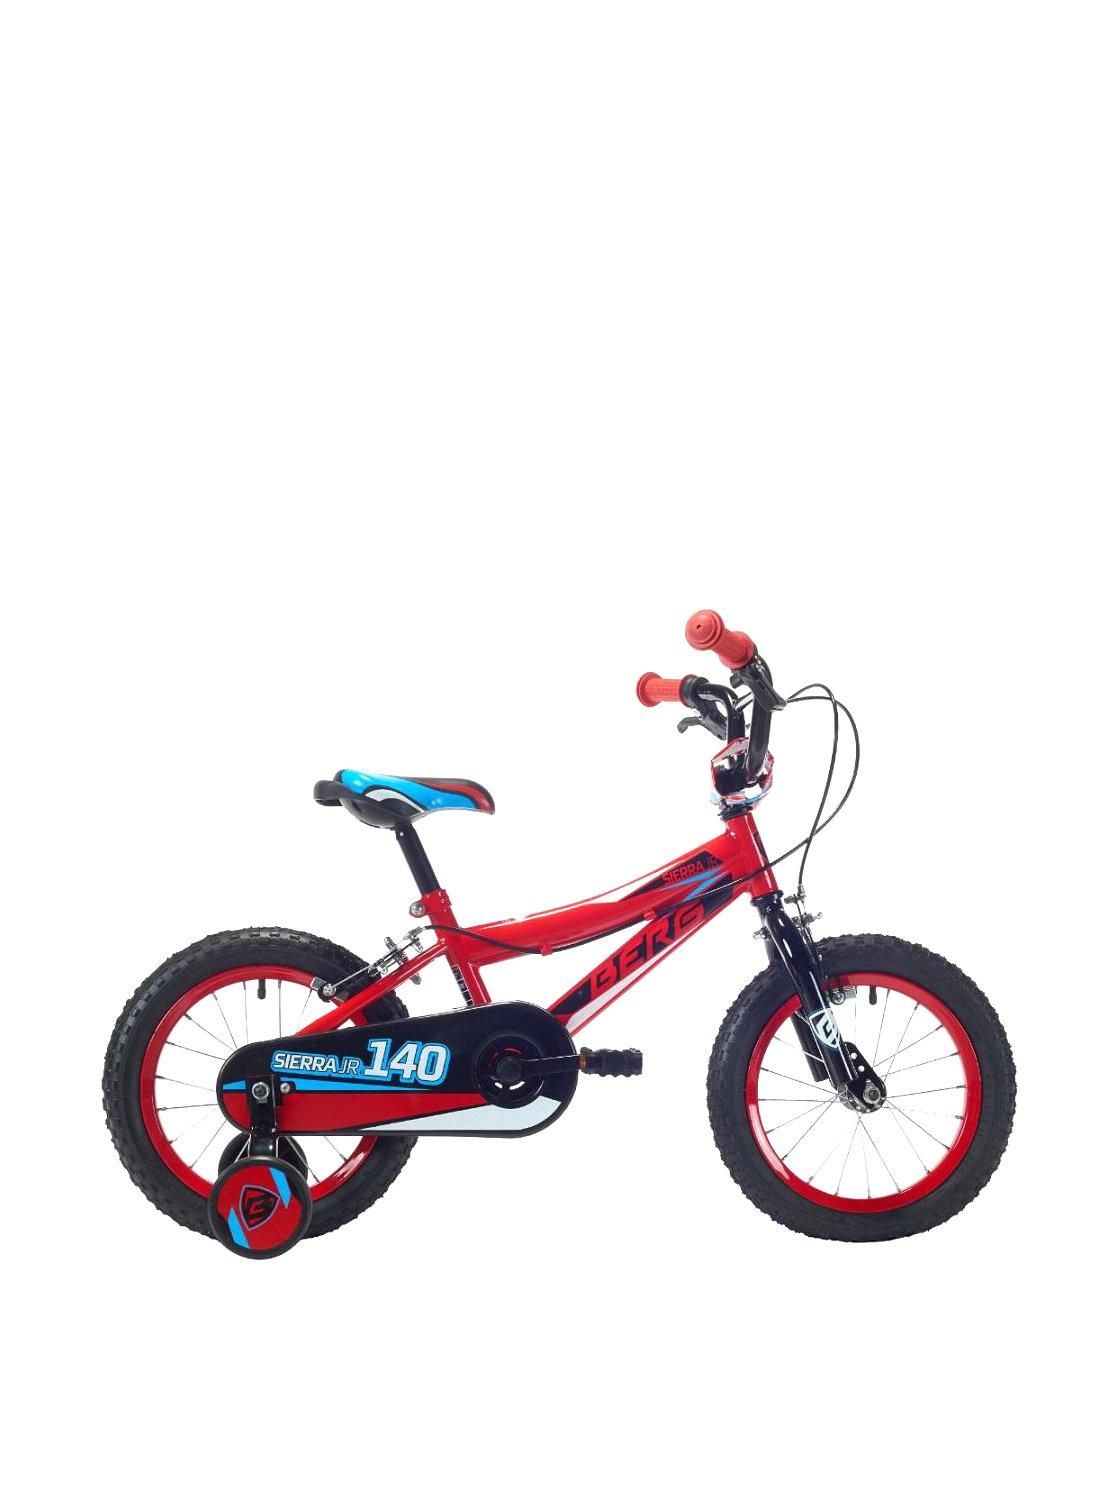 Berg Bicicleta Sierra Jr 140 V1 Rd/BK_Cy Rojo/Negro: Amazon.es ...